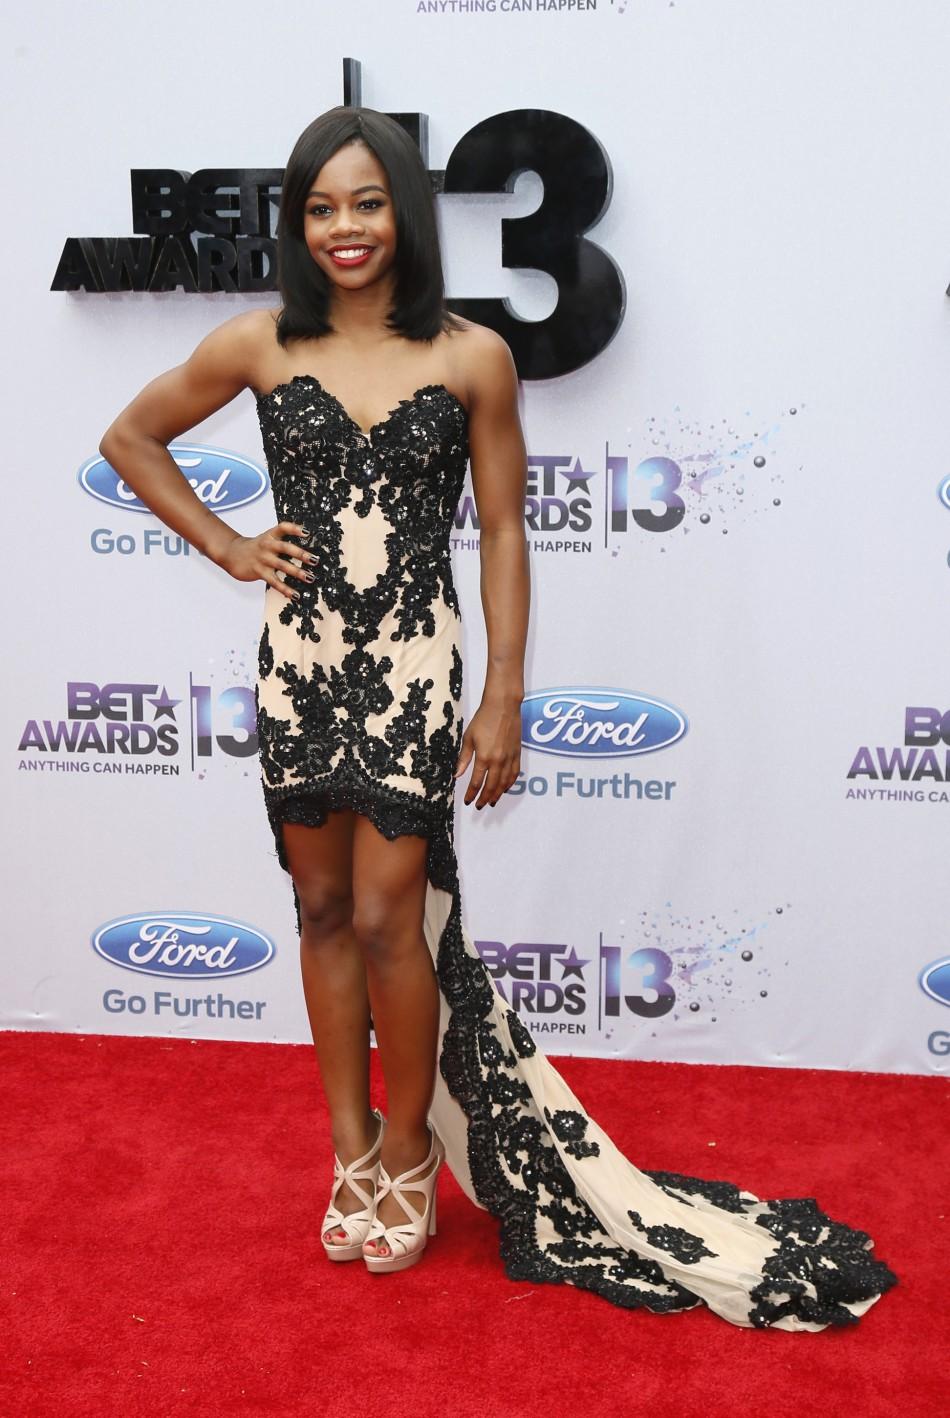 Olympian Gabby Douglas arrives at the 2013 BET Awards in Los Angeles, California June 30, 2013.